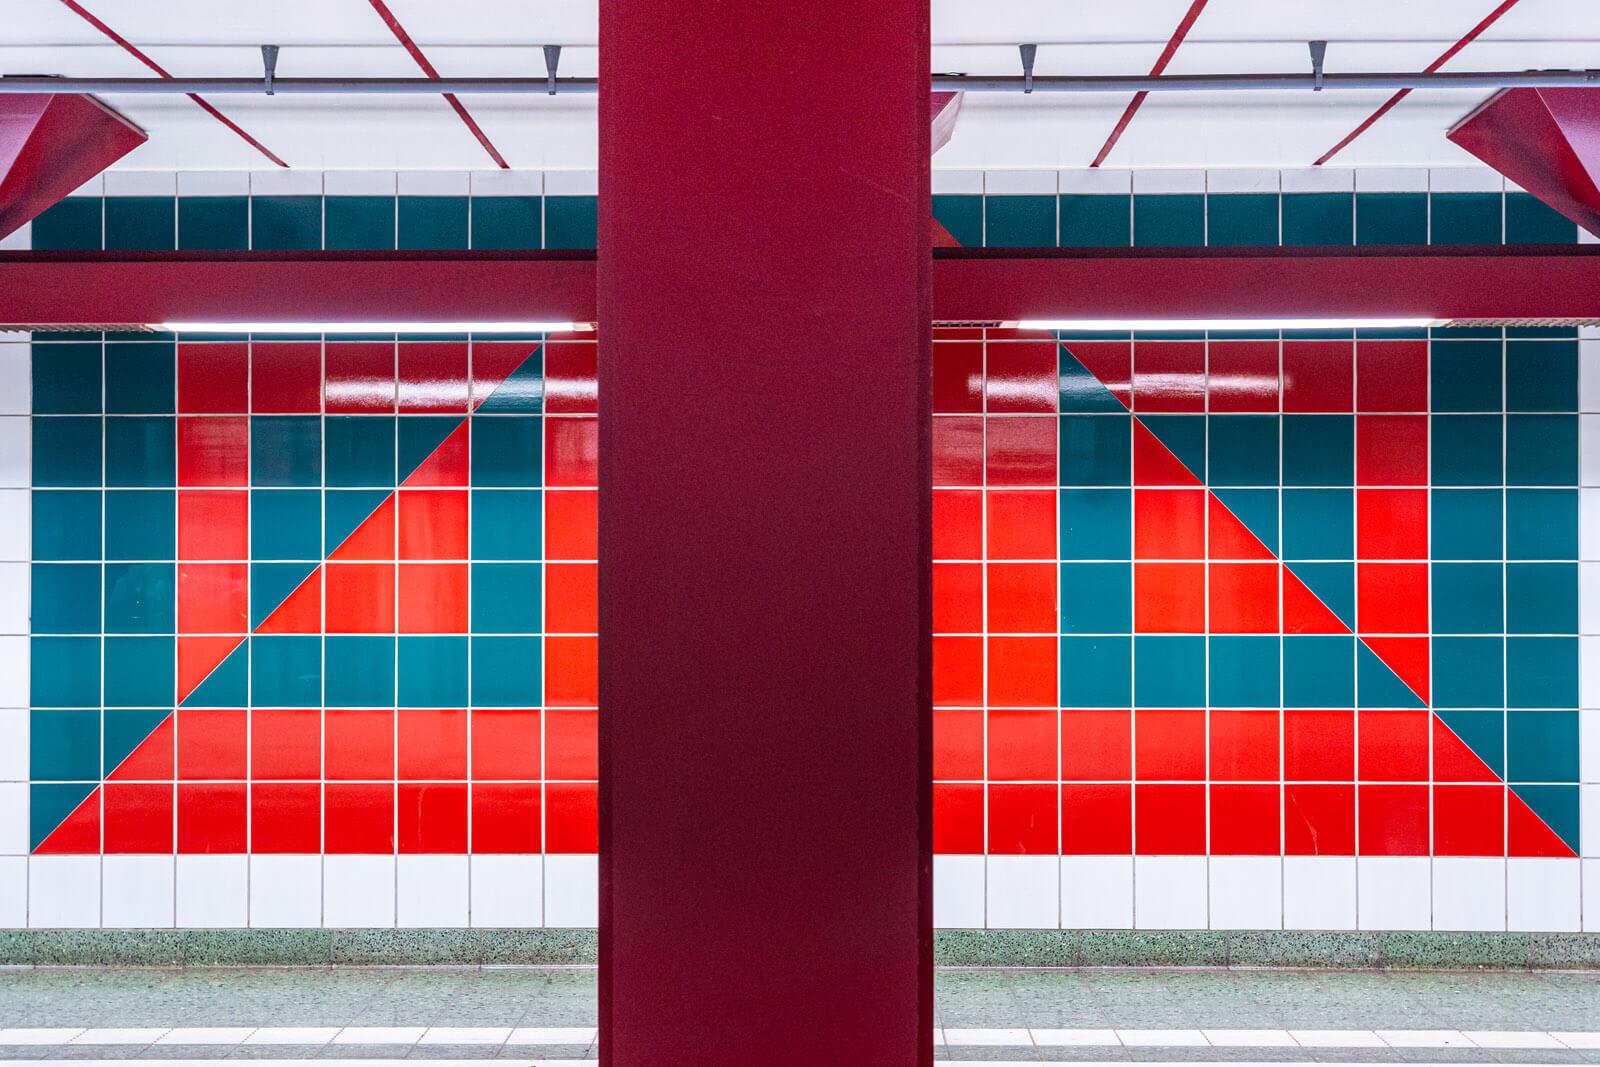 kacheln im Bahnhof Hagendeel